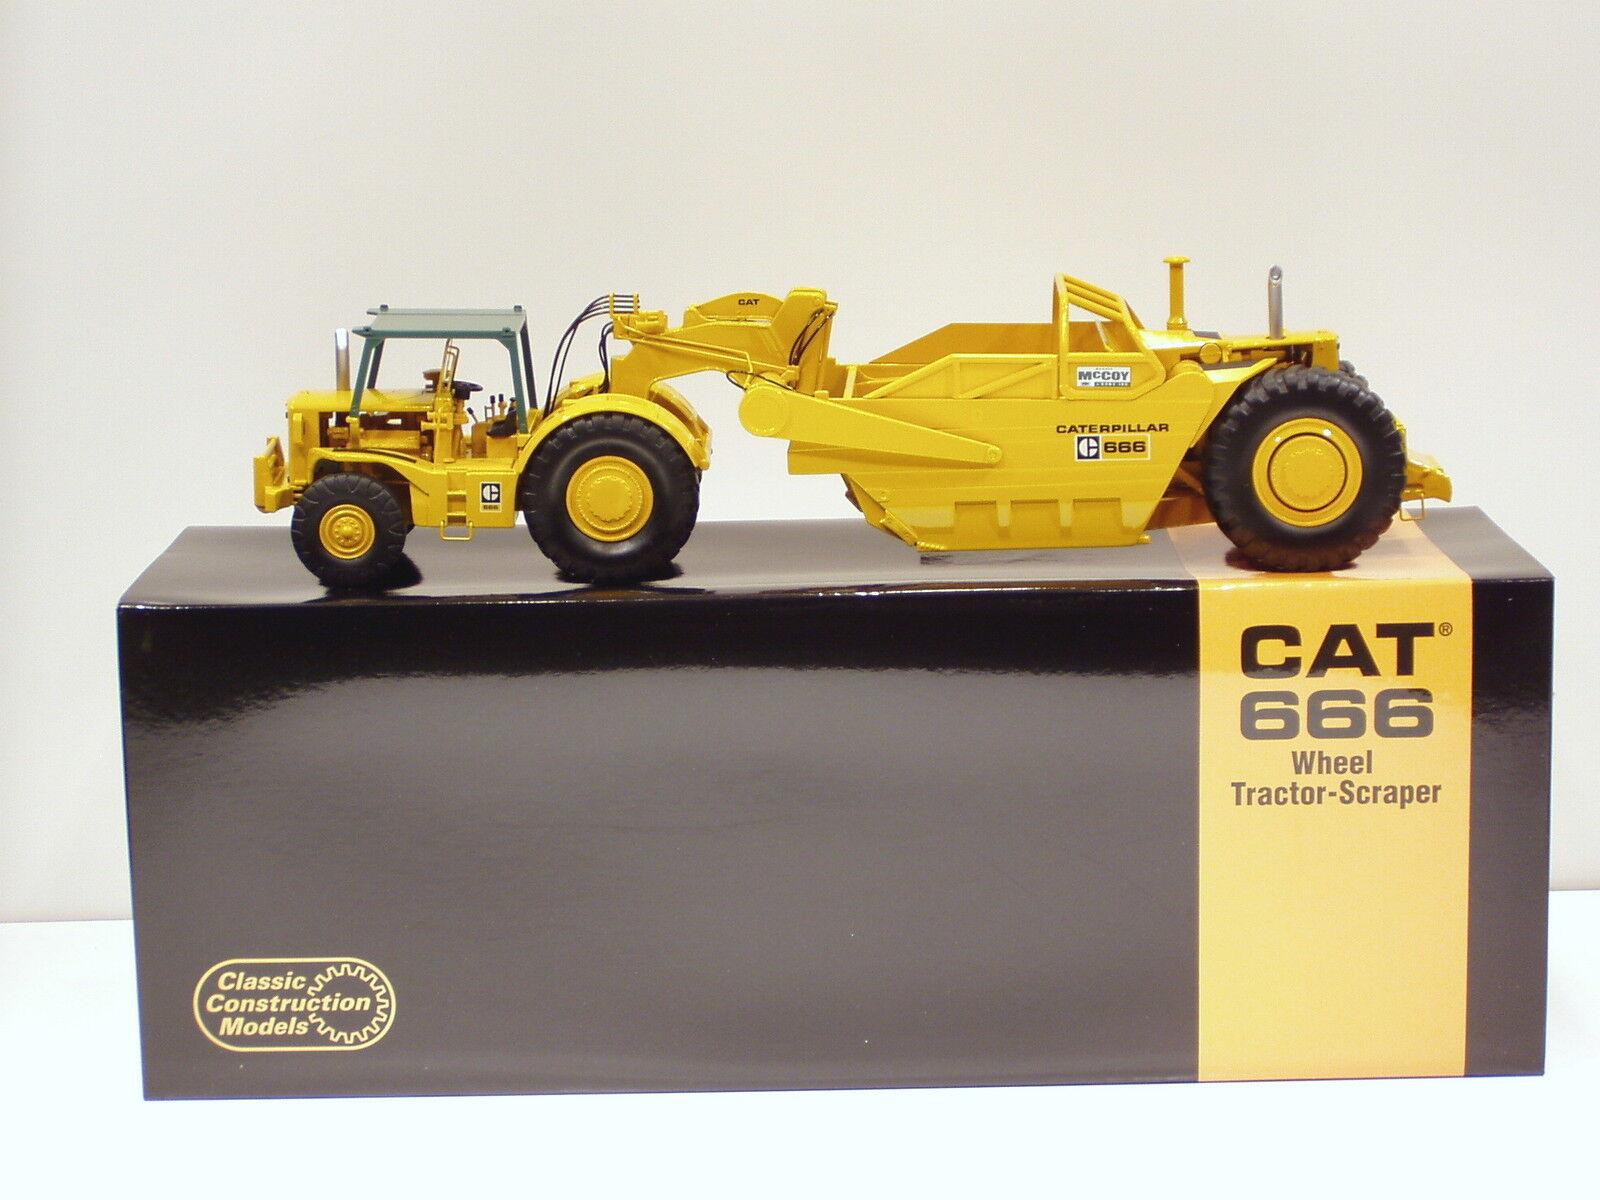 Caterpillar 666 Grattoir -  McCoy  - 1 48 - CCM-Diecast-Neuf 2010